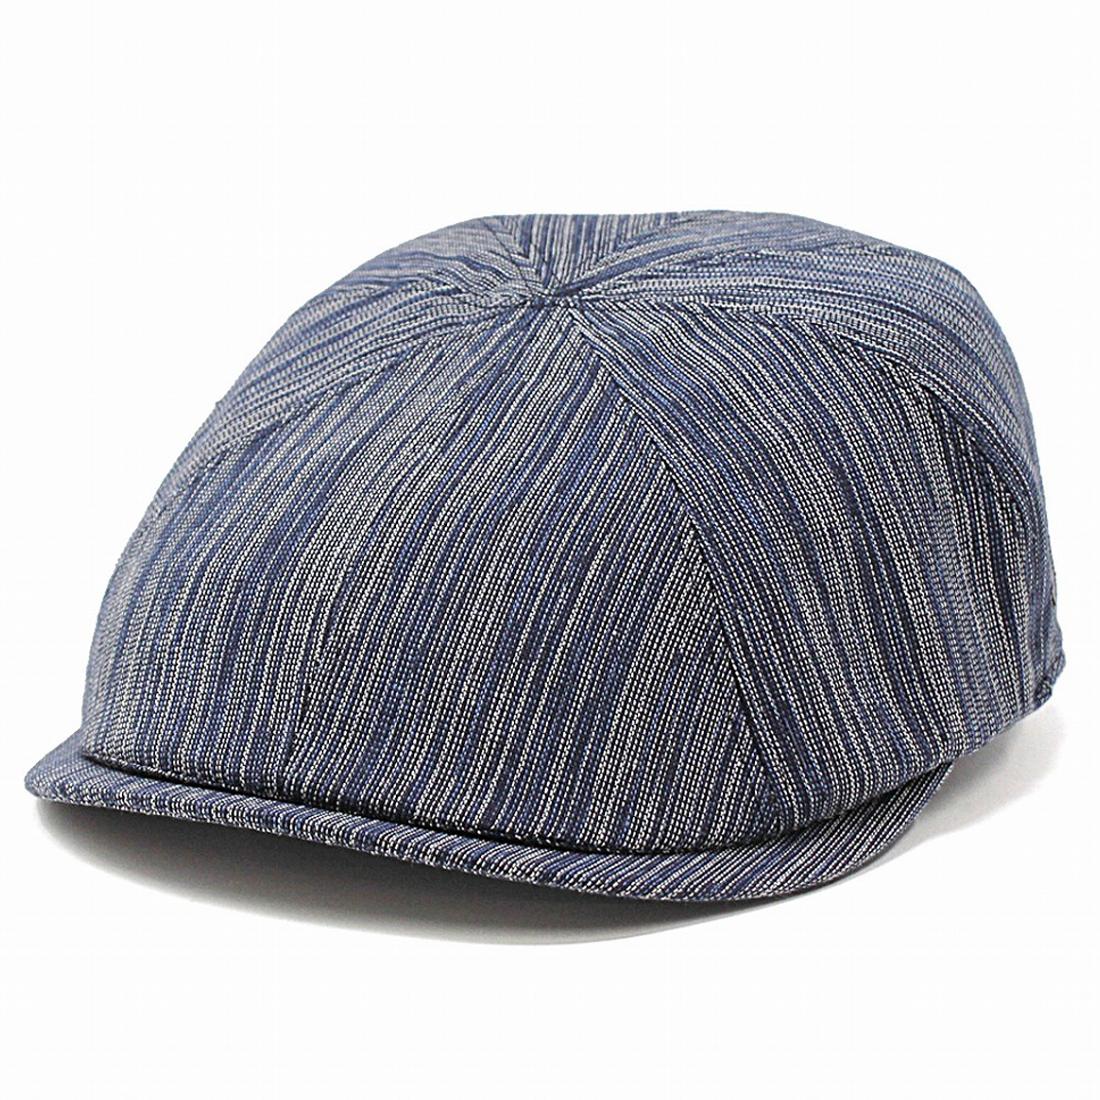 Comfortable Dad Hat Baseball Cap BH Cool Designs got Shaun?